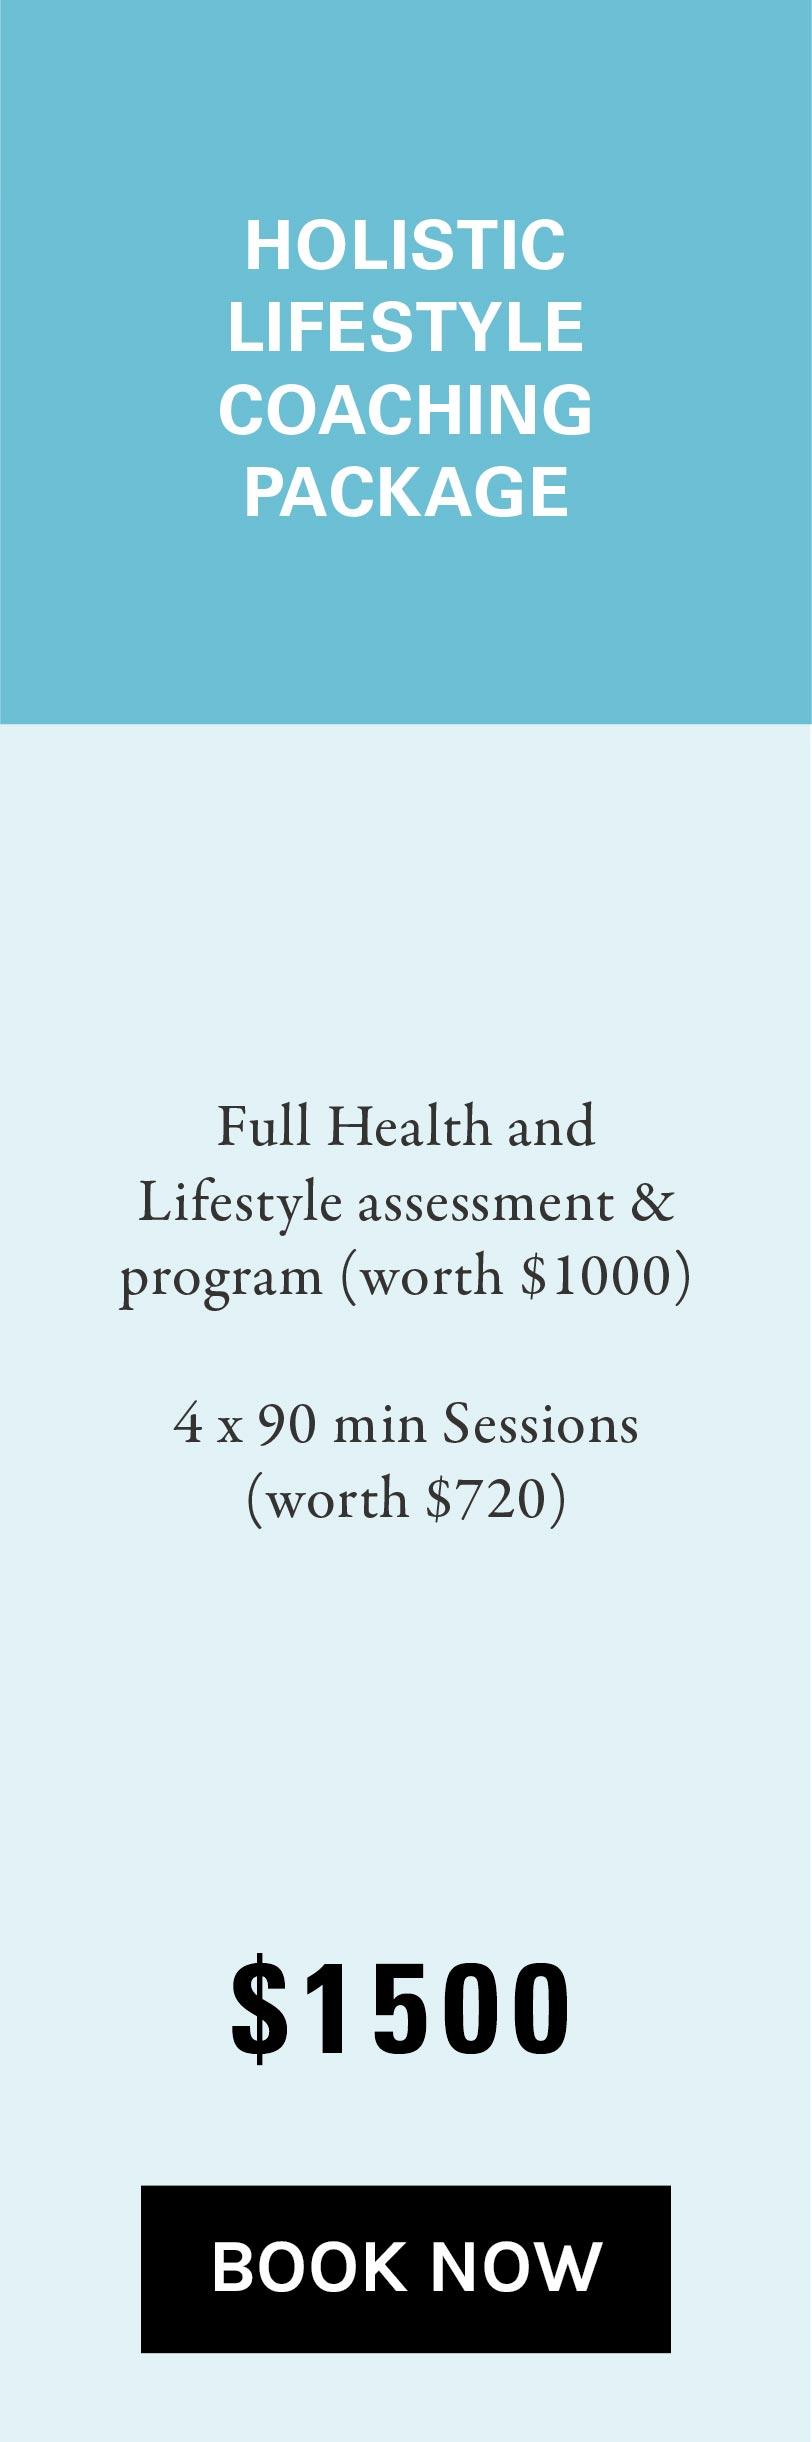 rhythm-health-package-graphic1-08.jpg